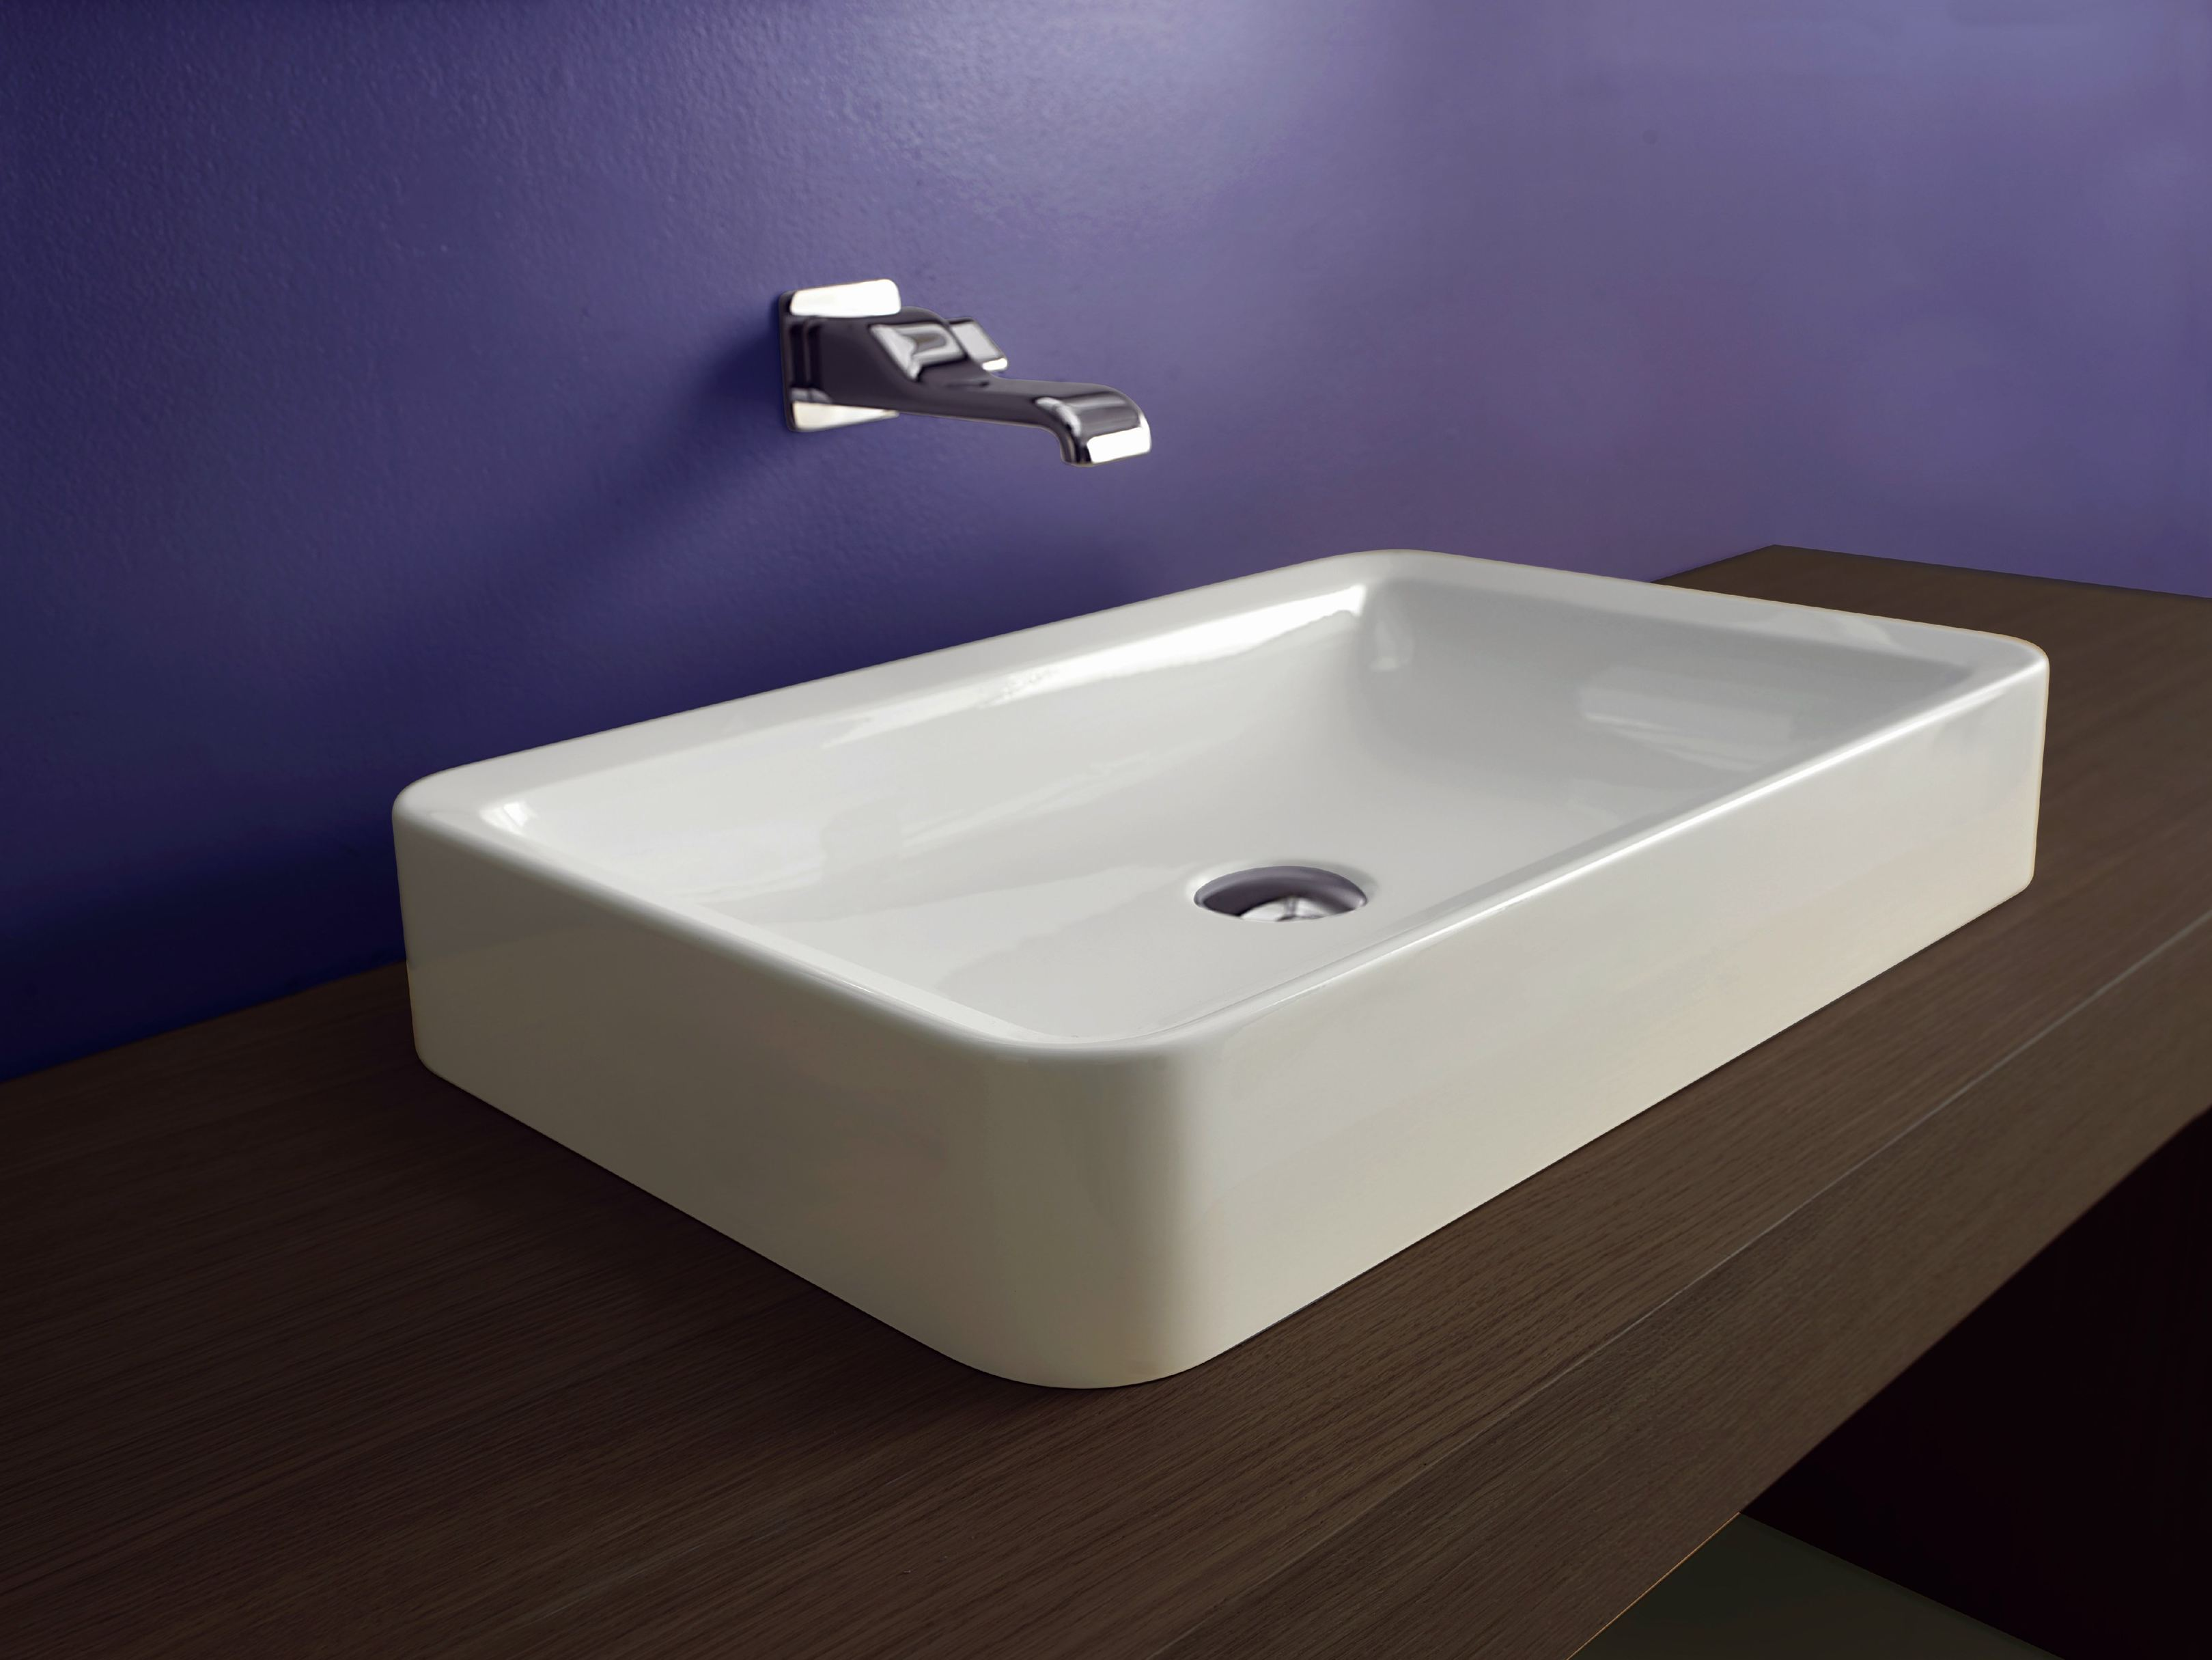 nile lavabo rectangulaire by ceramica flaminia design patrick norguet. Black Bedroom Furniture Sets. Home Design Ideas